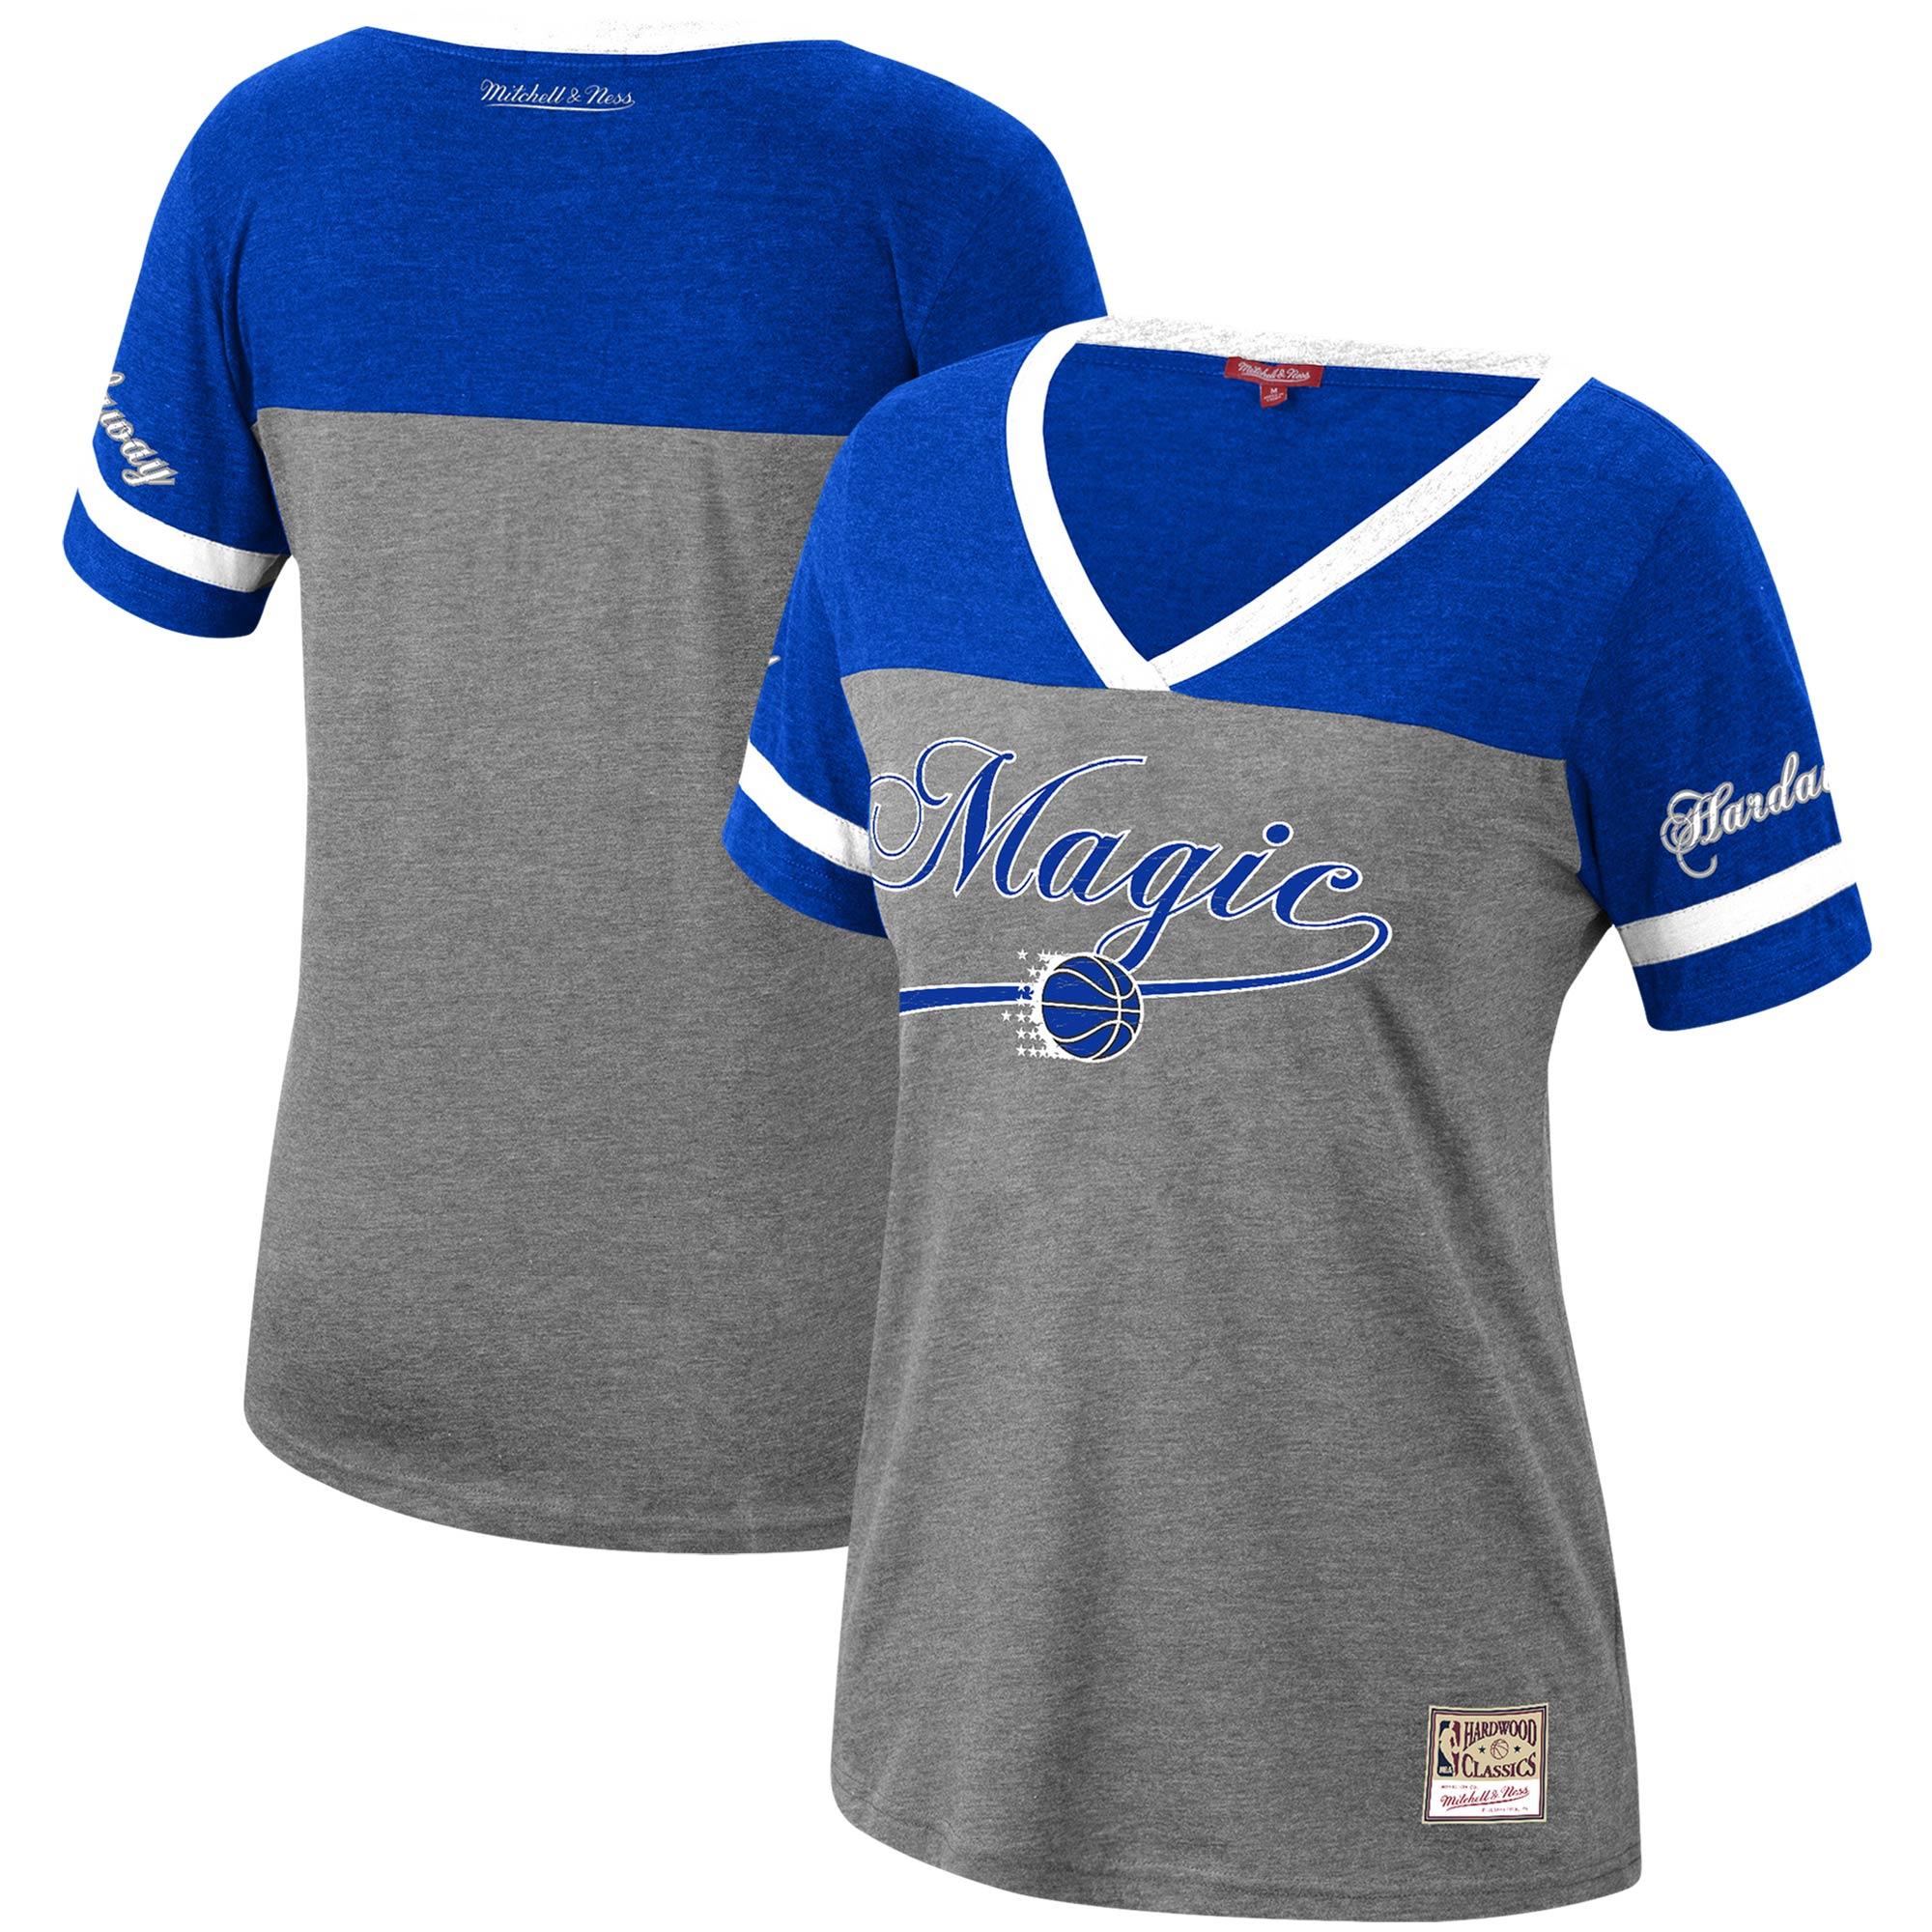 Penny Hardaway Orlando Magic Mitchell & Ness Women's Heathered Charcoal Team Captain V-Neck T-Shirt